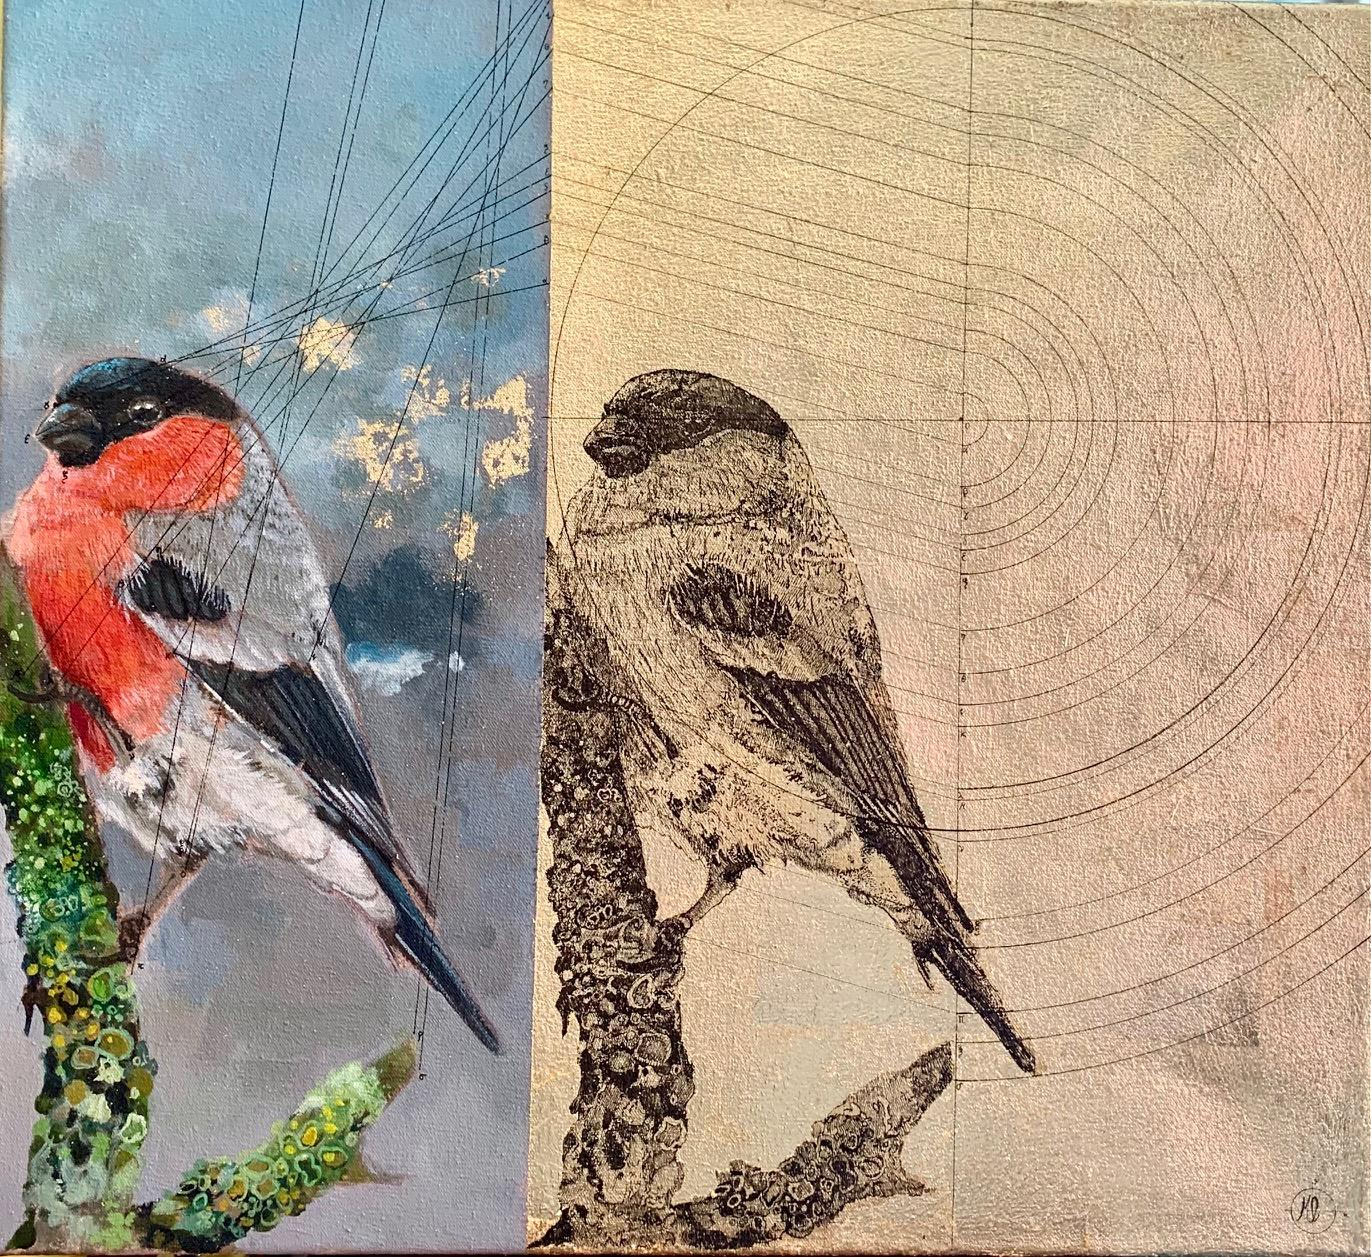 Geometry of a Bullfinch - contemporary decorative bird mixed media painting